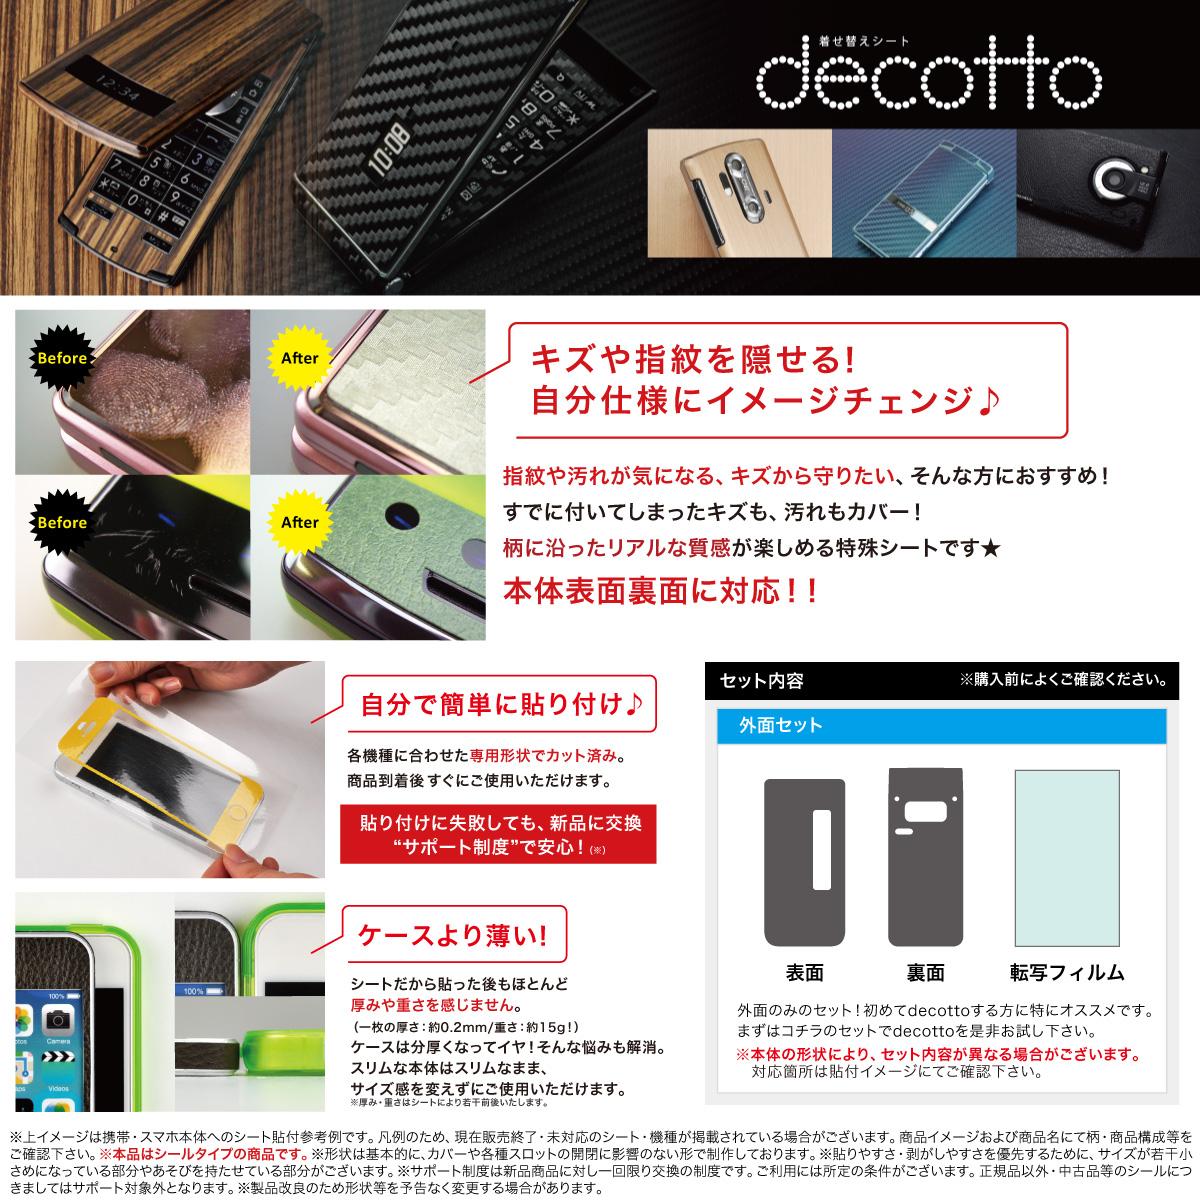 XperiaXZ1 SO-01K SOV36 701SO 専用 デコ デザインシート decotto 外面(表裏)セット 【 レザー・カーボン他 柄が選べます】